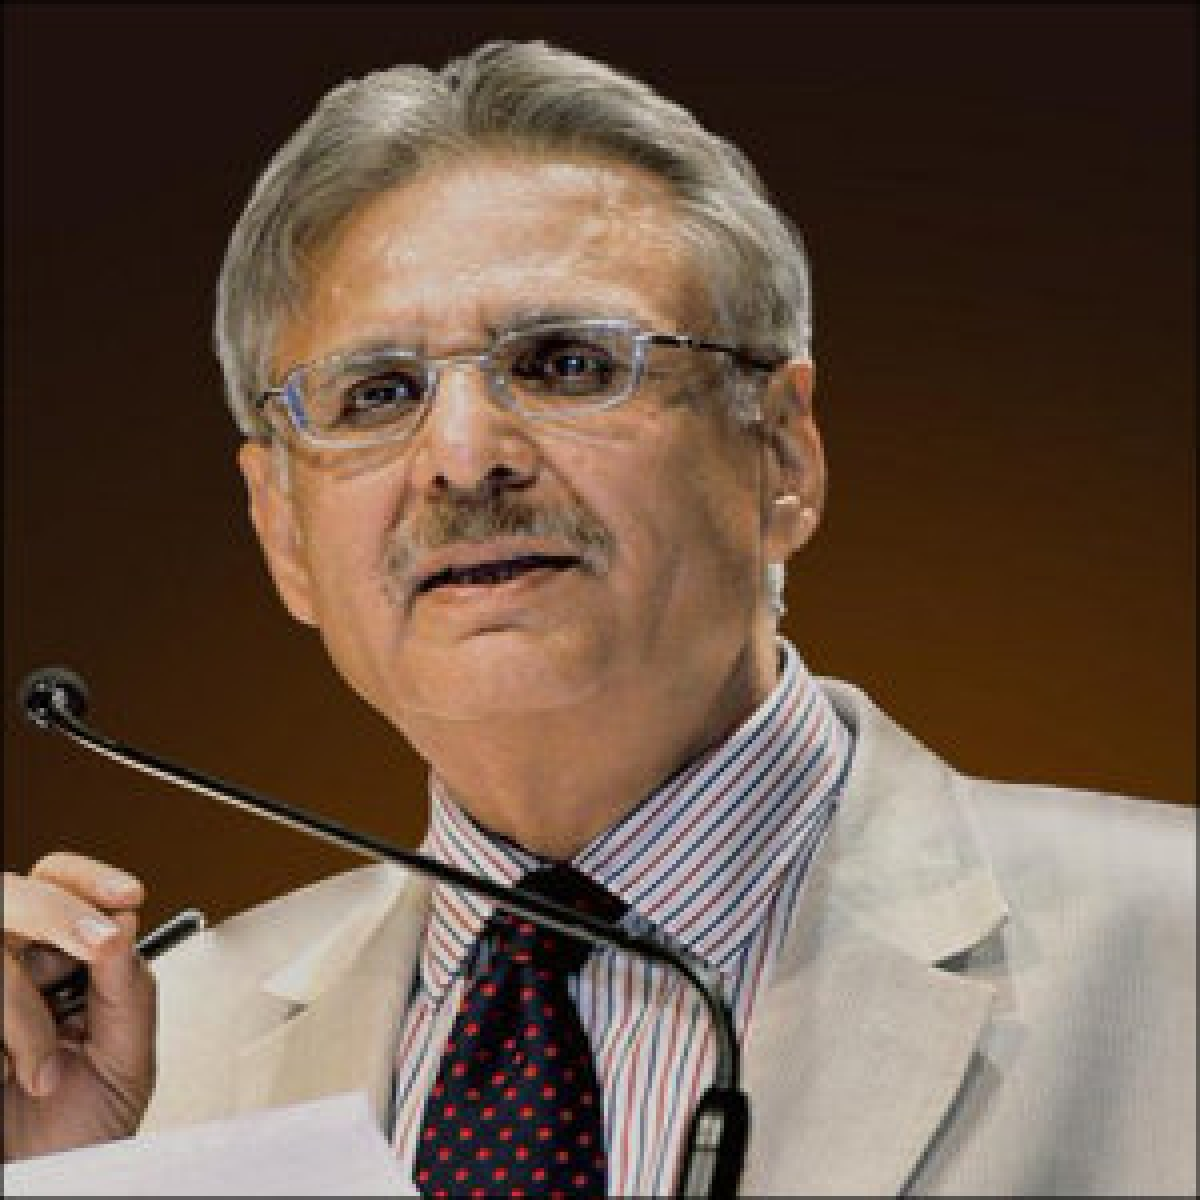 ITC Chairman YC Deveshwar passes away at 72